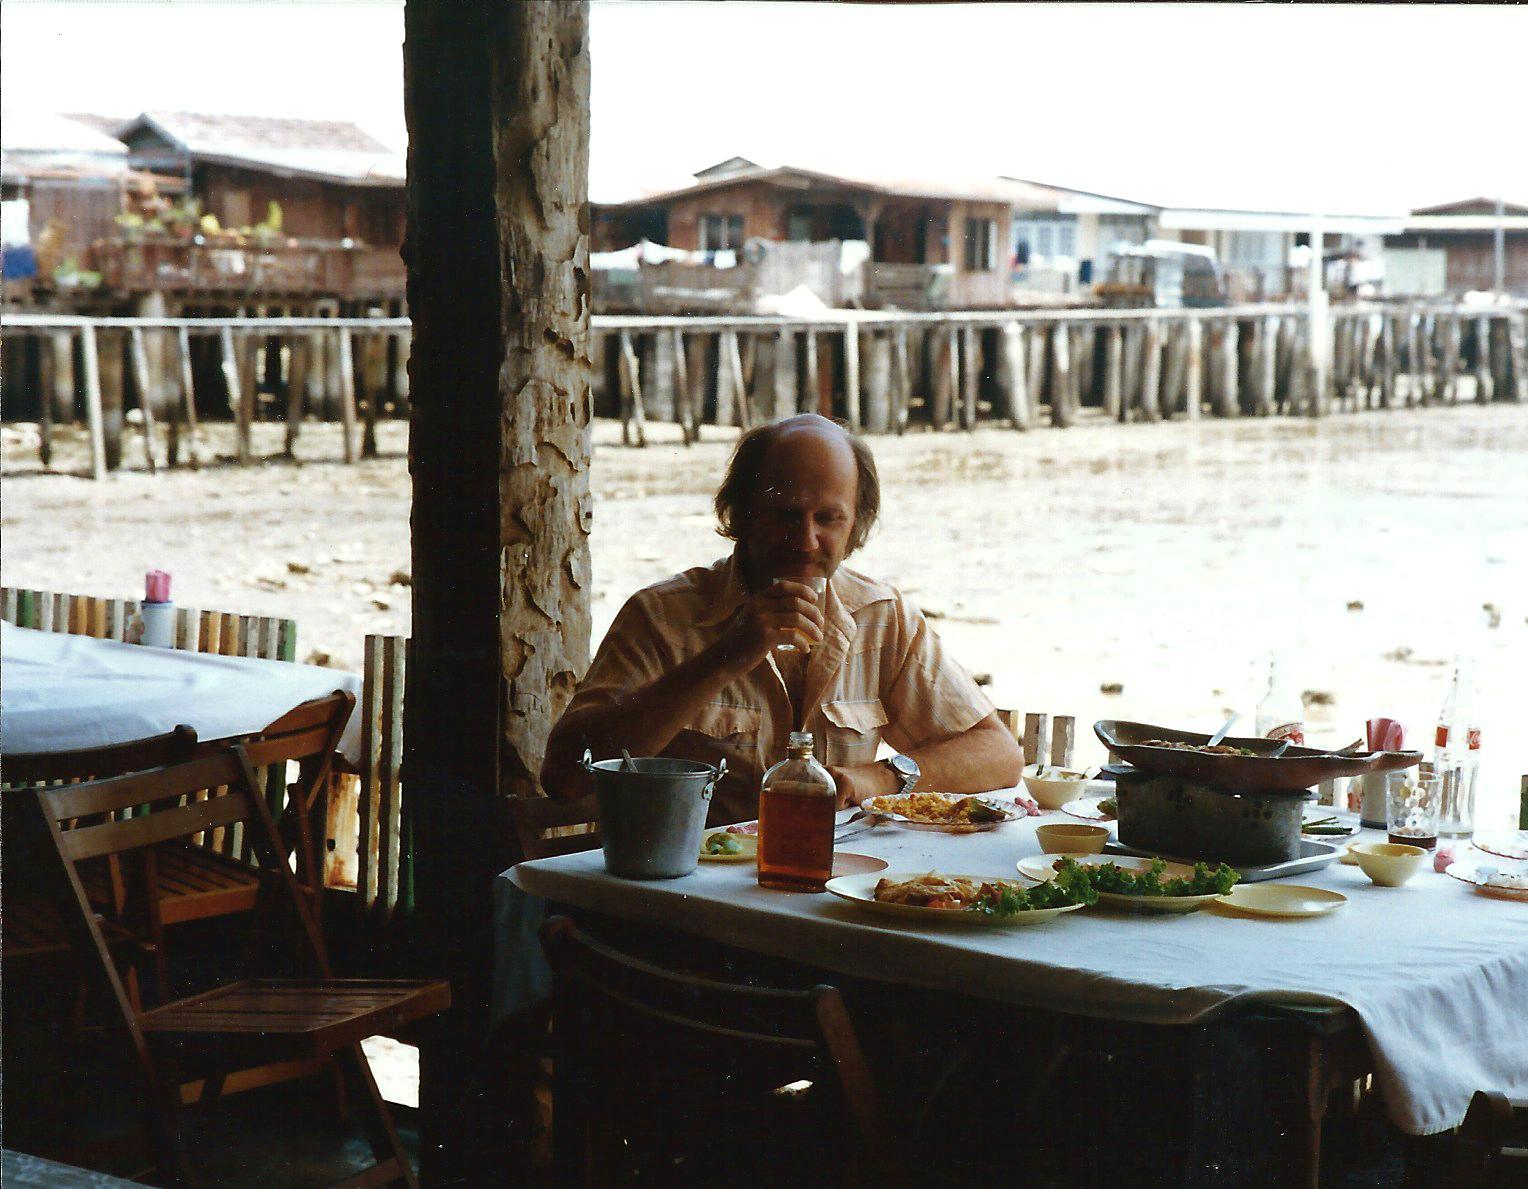 Pedro Meier Multimedia Artist wih Vasan Sitthiket Thai contemporary visual artist – National Art Museum – Faculty of Arts, Silpakorn University Bangkok – Photo around 1983 © Pedro Meier/ProLitteris